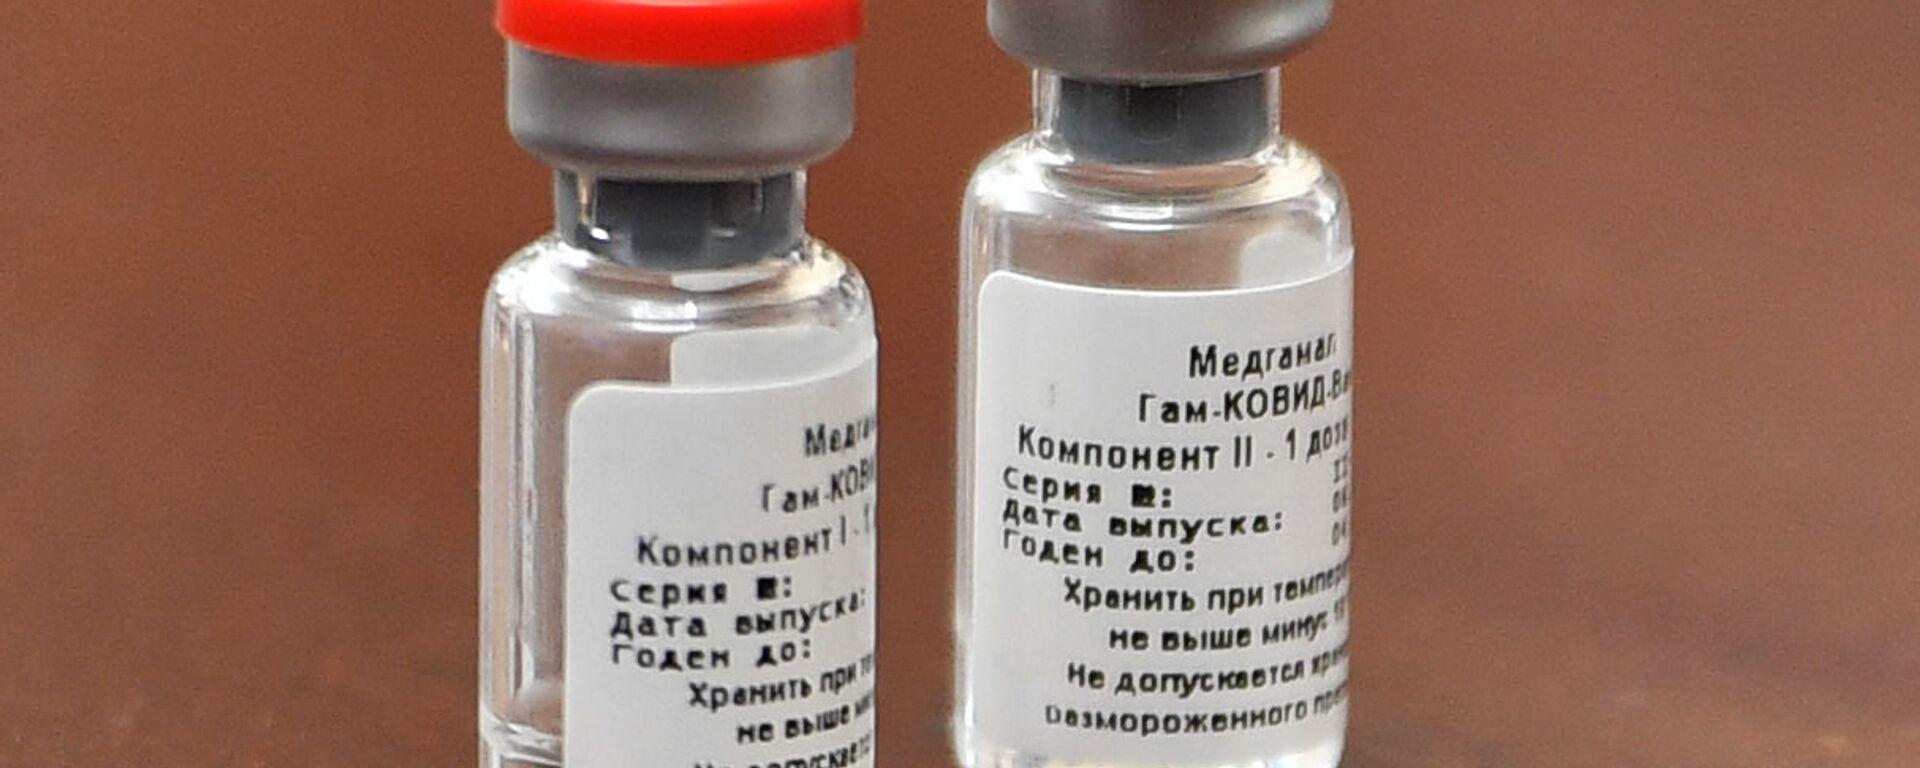 Sputnik V, La vacuna rusa contra el COVID-19 - Sputnik Mundo, 1920, 16.12.2020